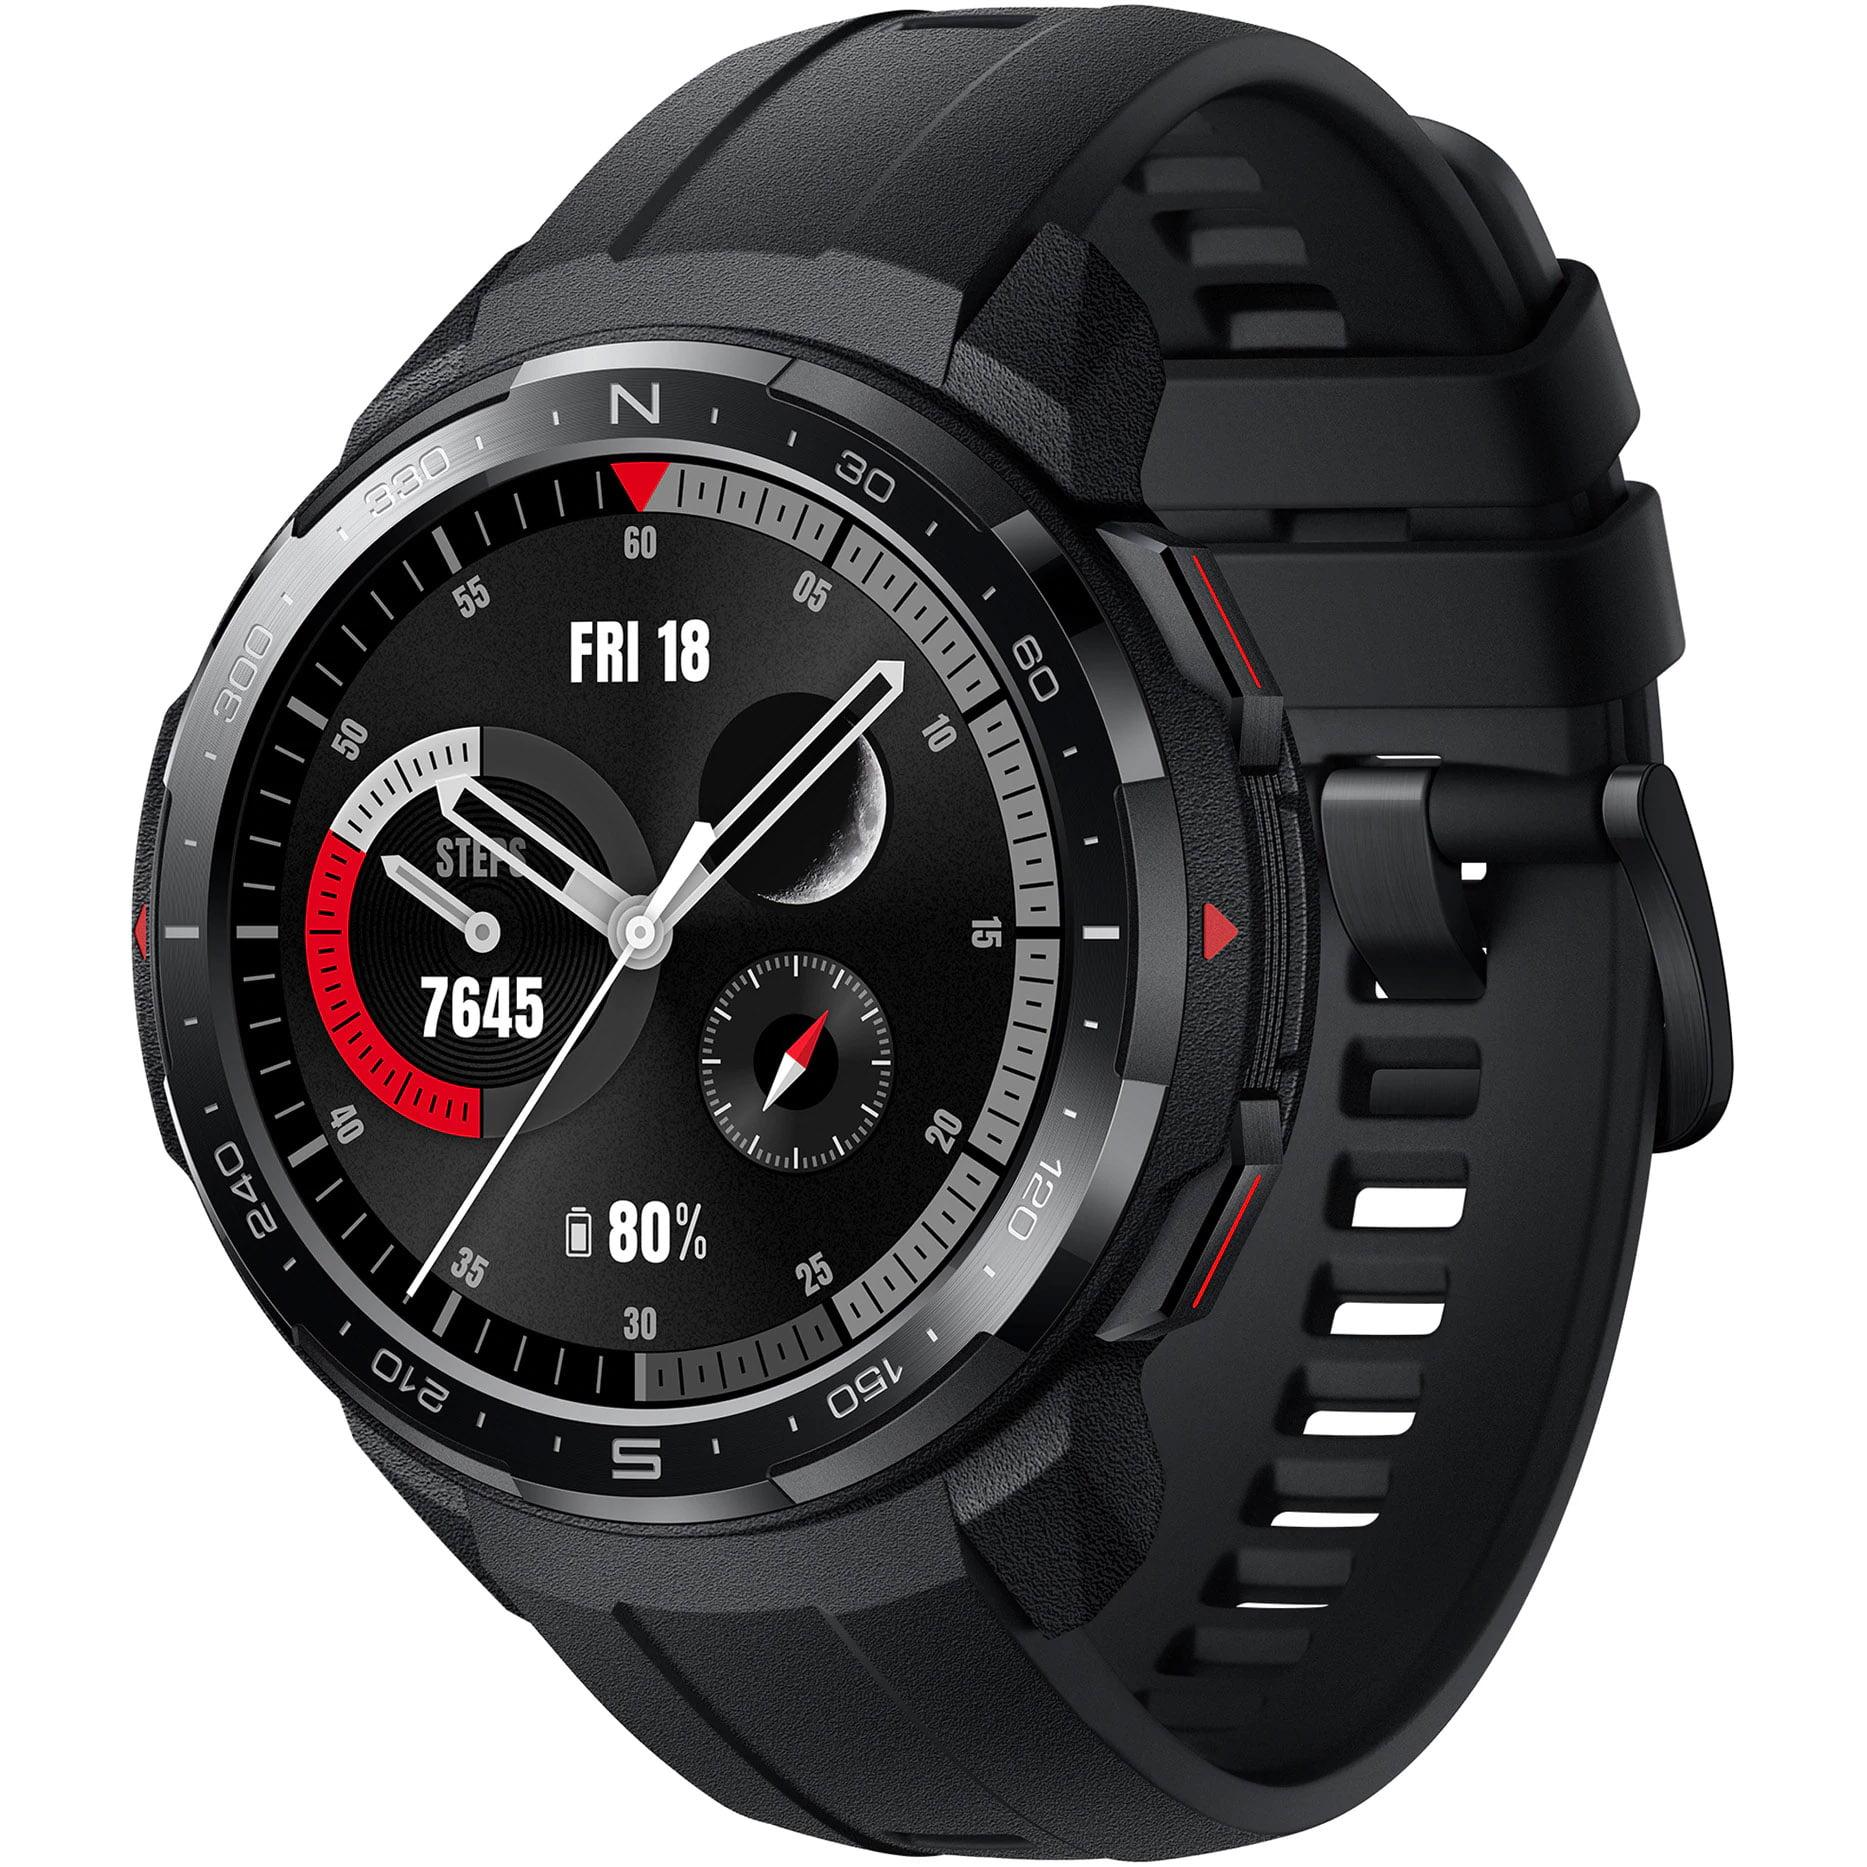 Ceas Smartwatch Honor Watch GS Pro, 48mm, GPS, Charcoal Black